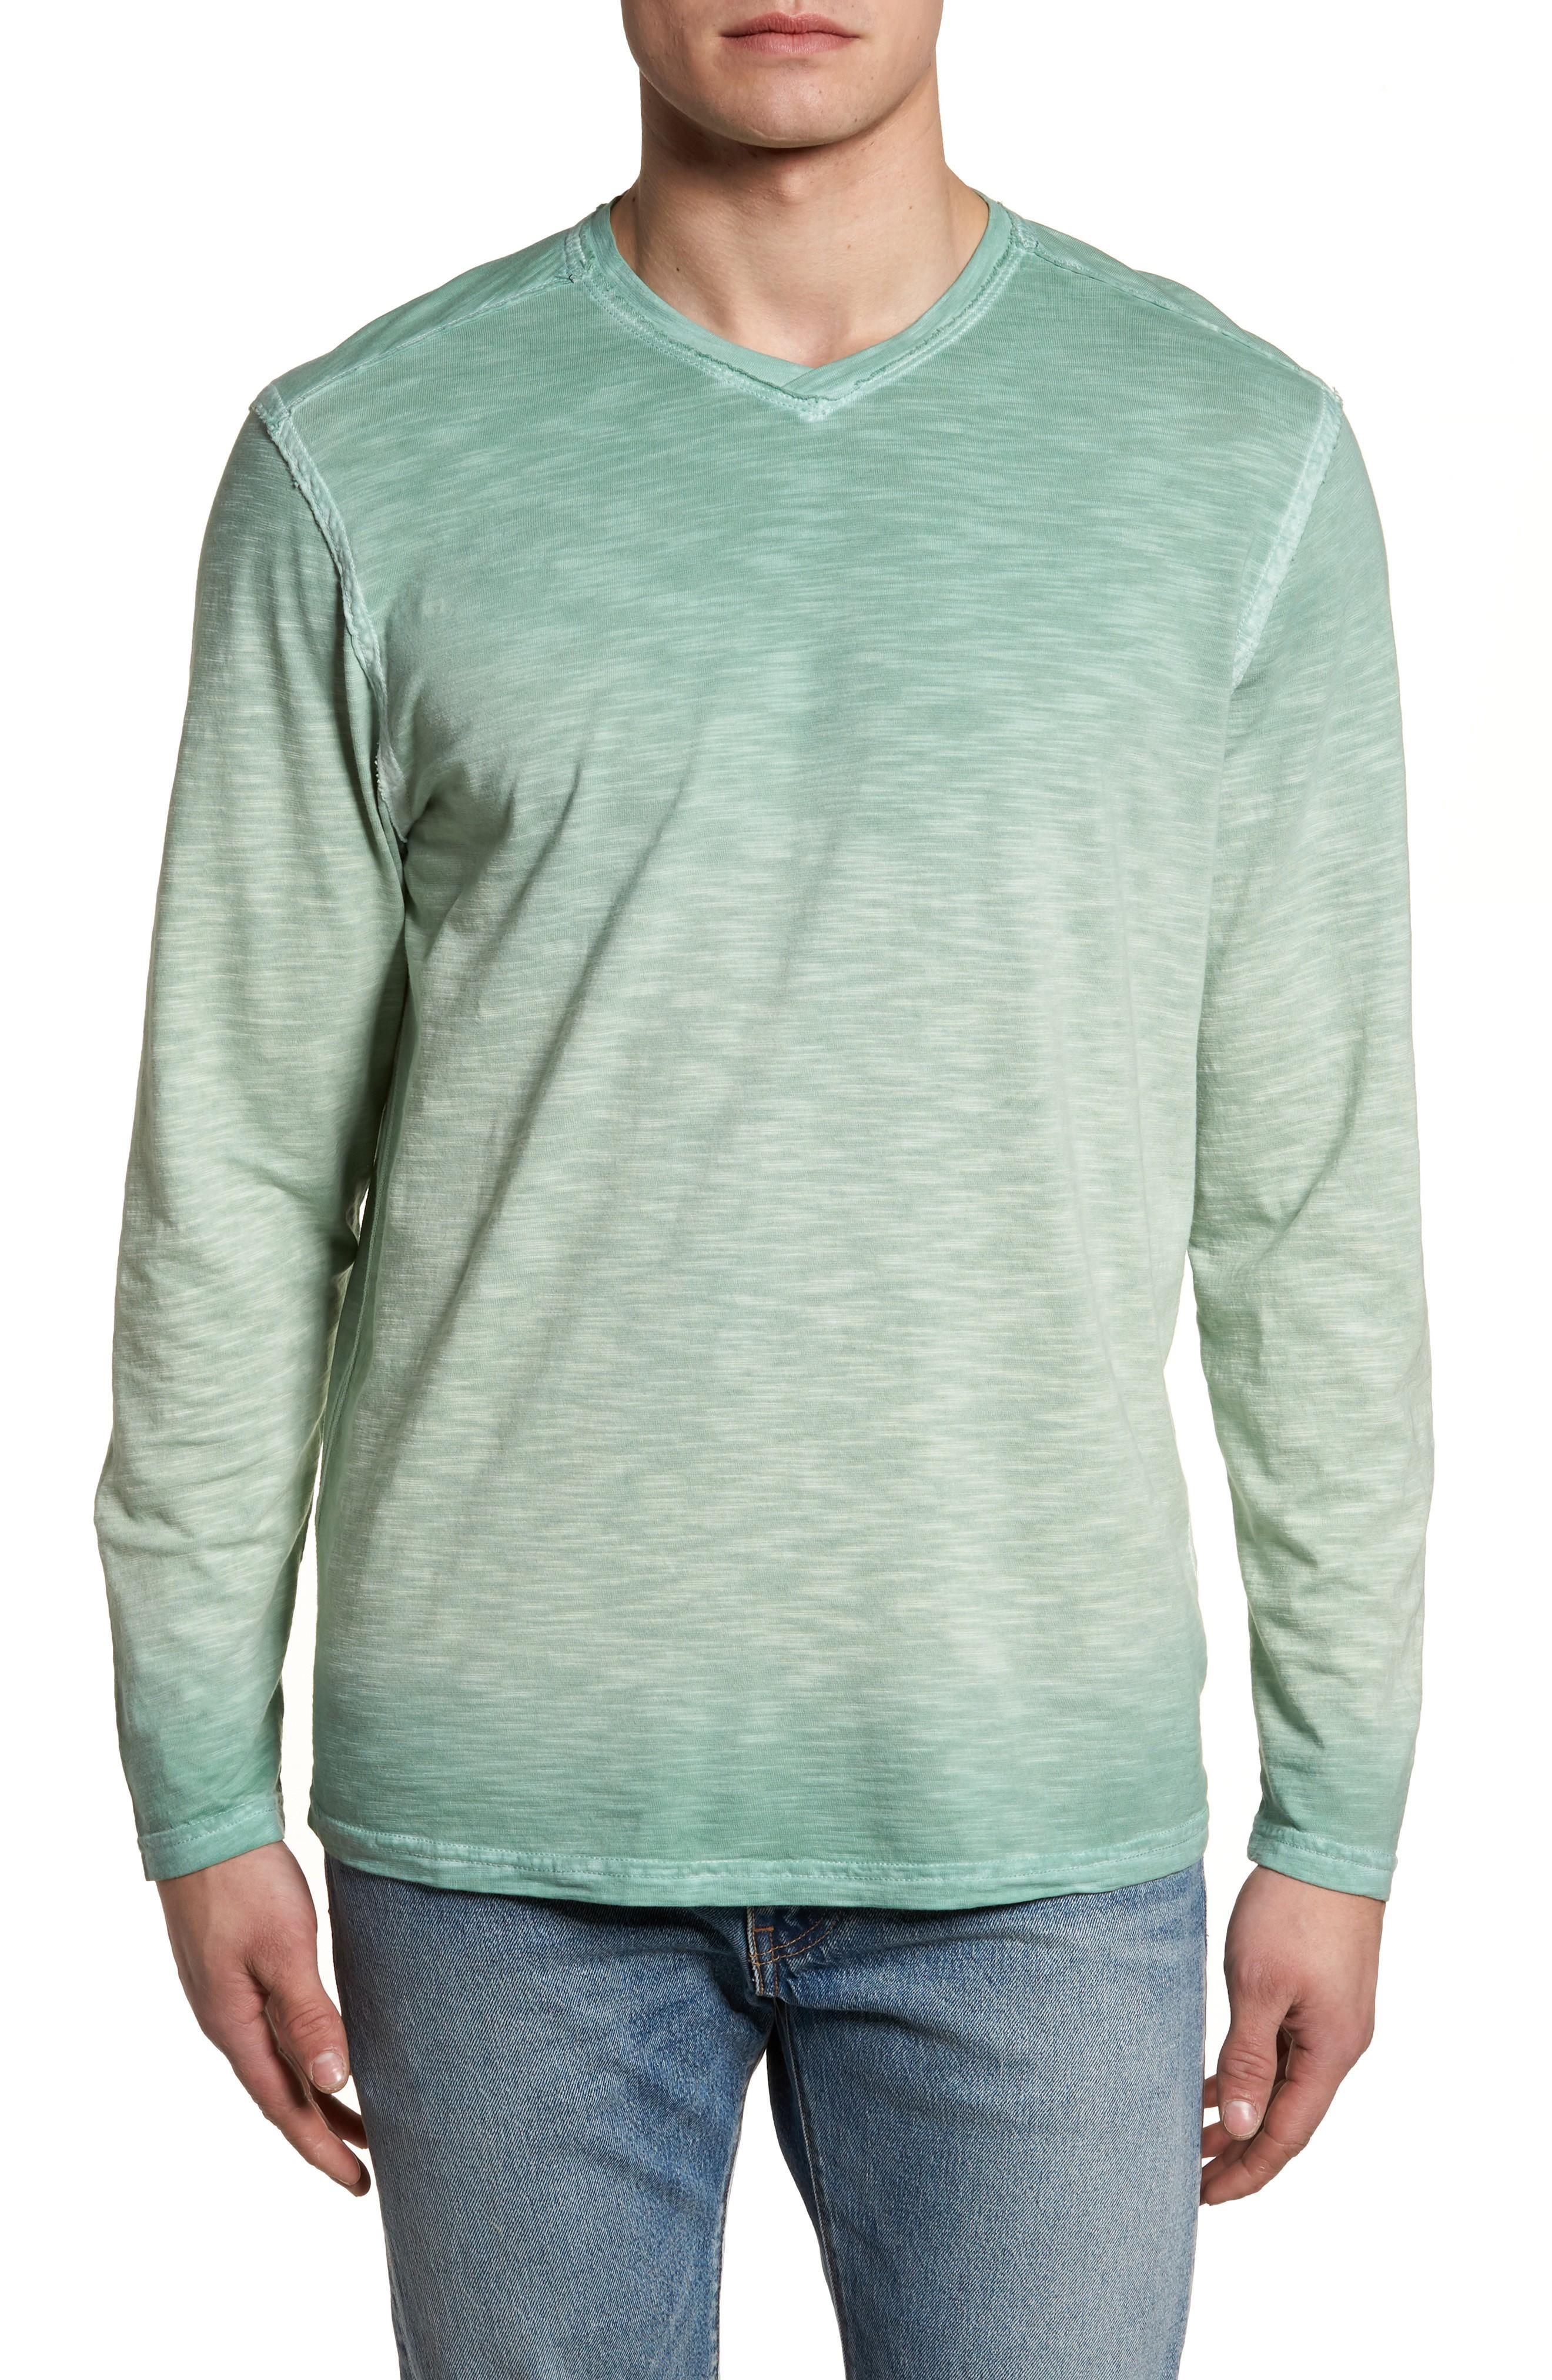 34e69ab4 Tommy Bahama Jeans Long Sleeve Shirt